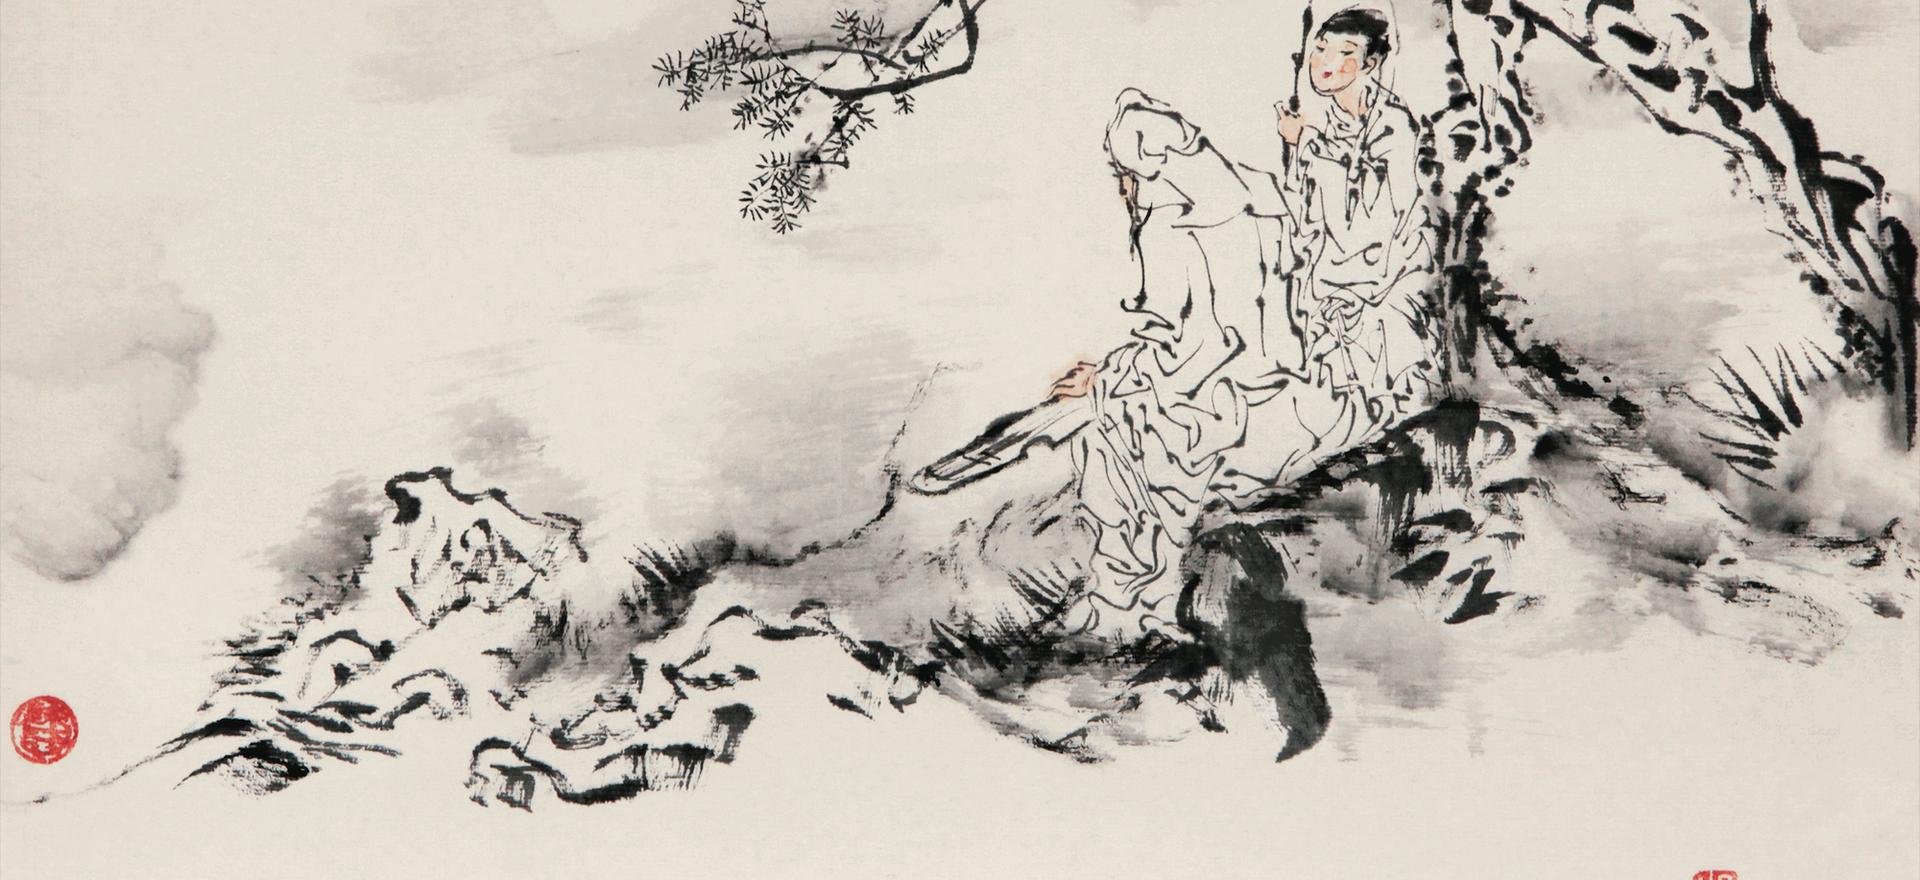 陳嘯風 《古風》,2002年